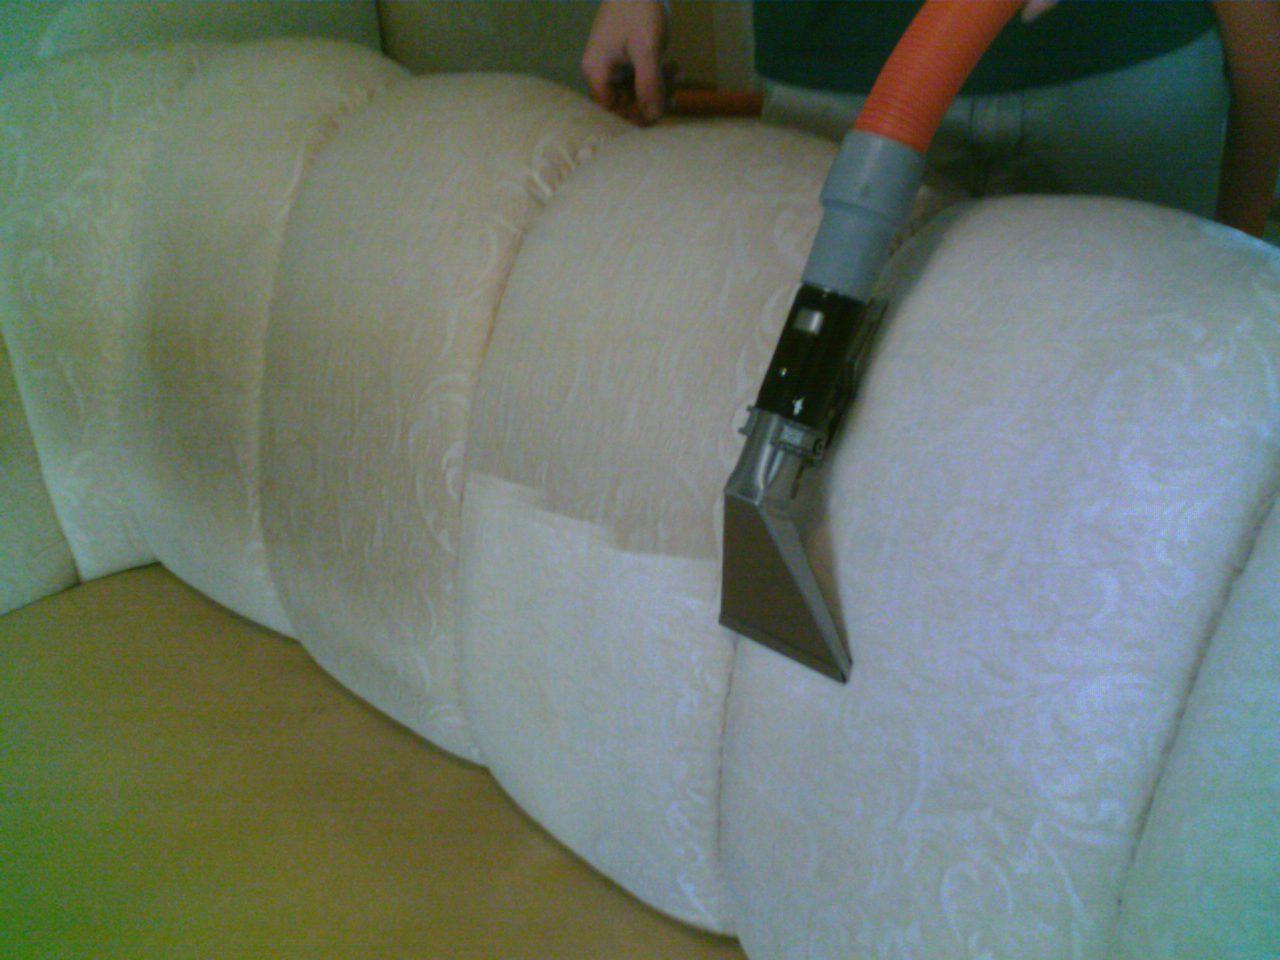 Как почистить диван в домашних условиях от грязи и запаха 49